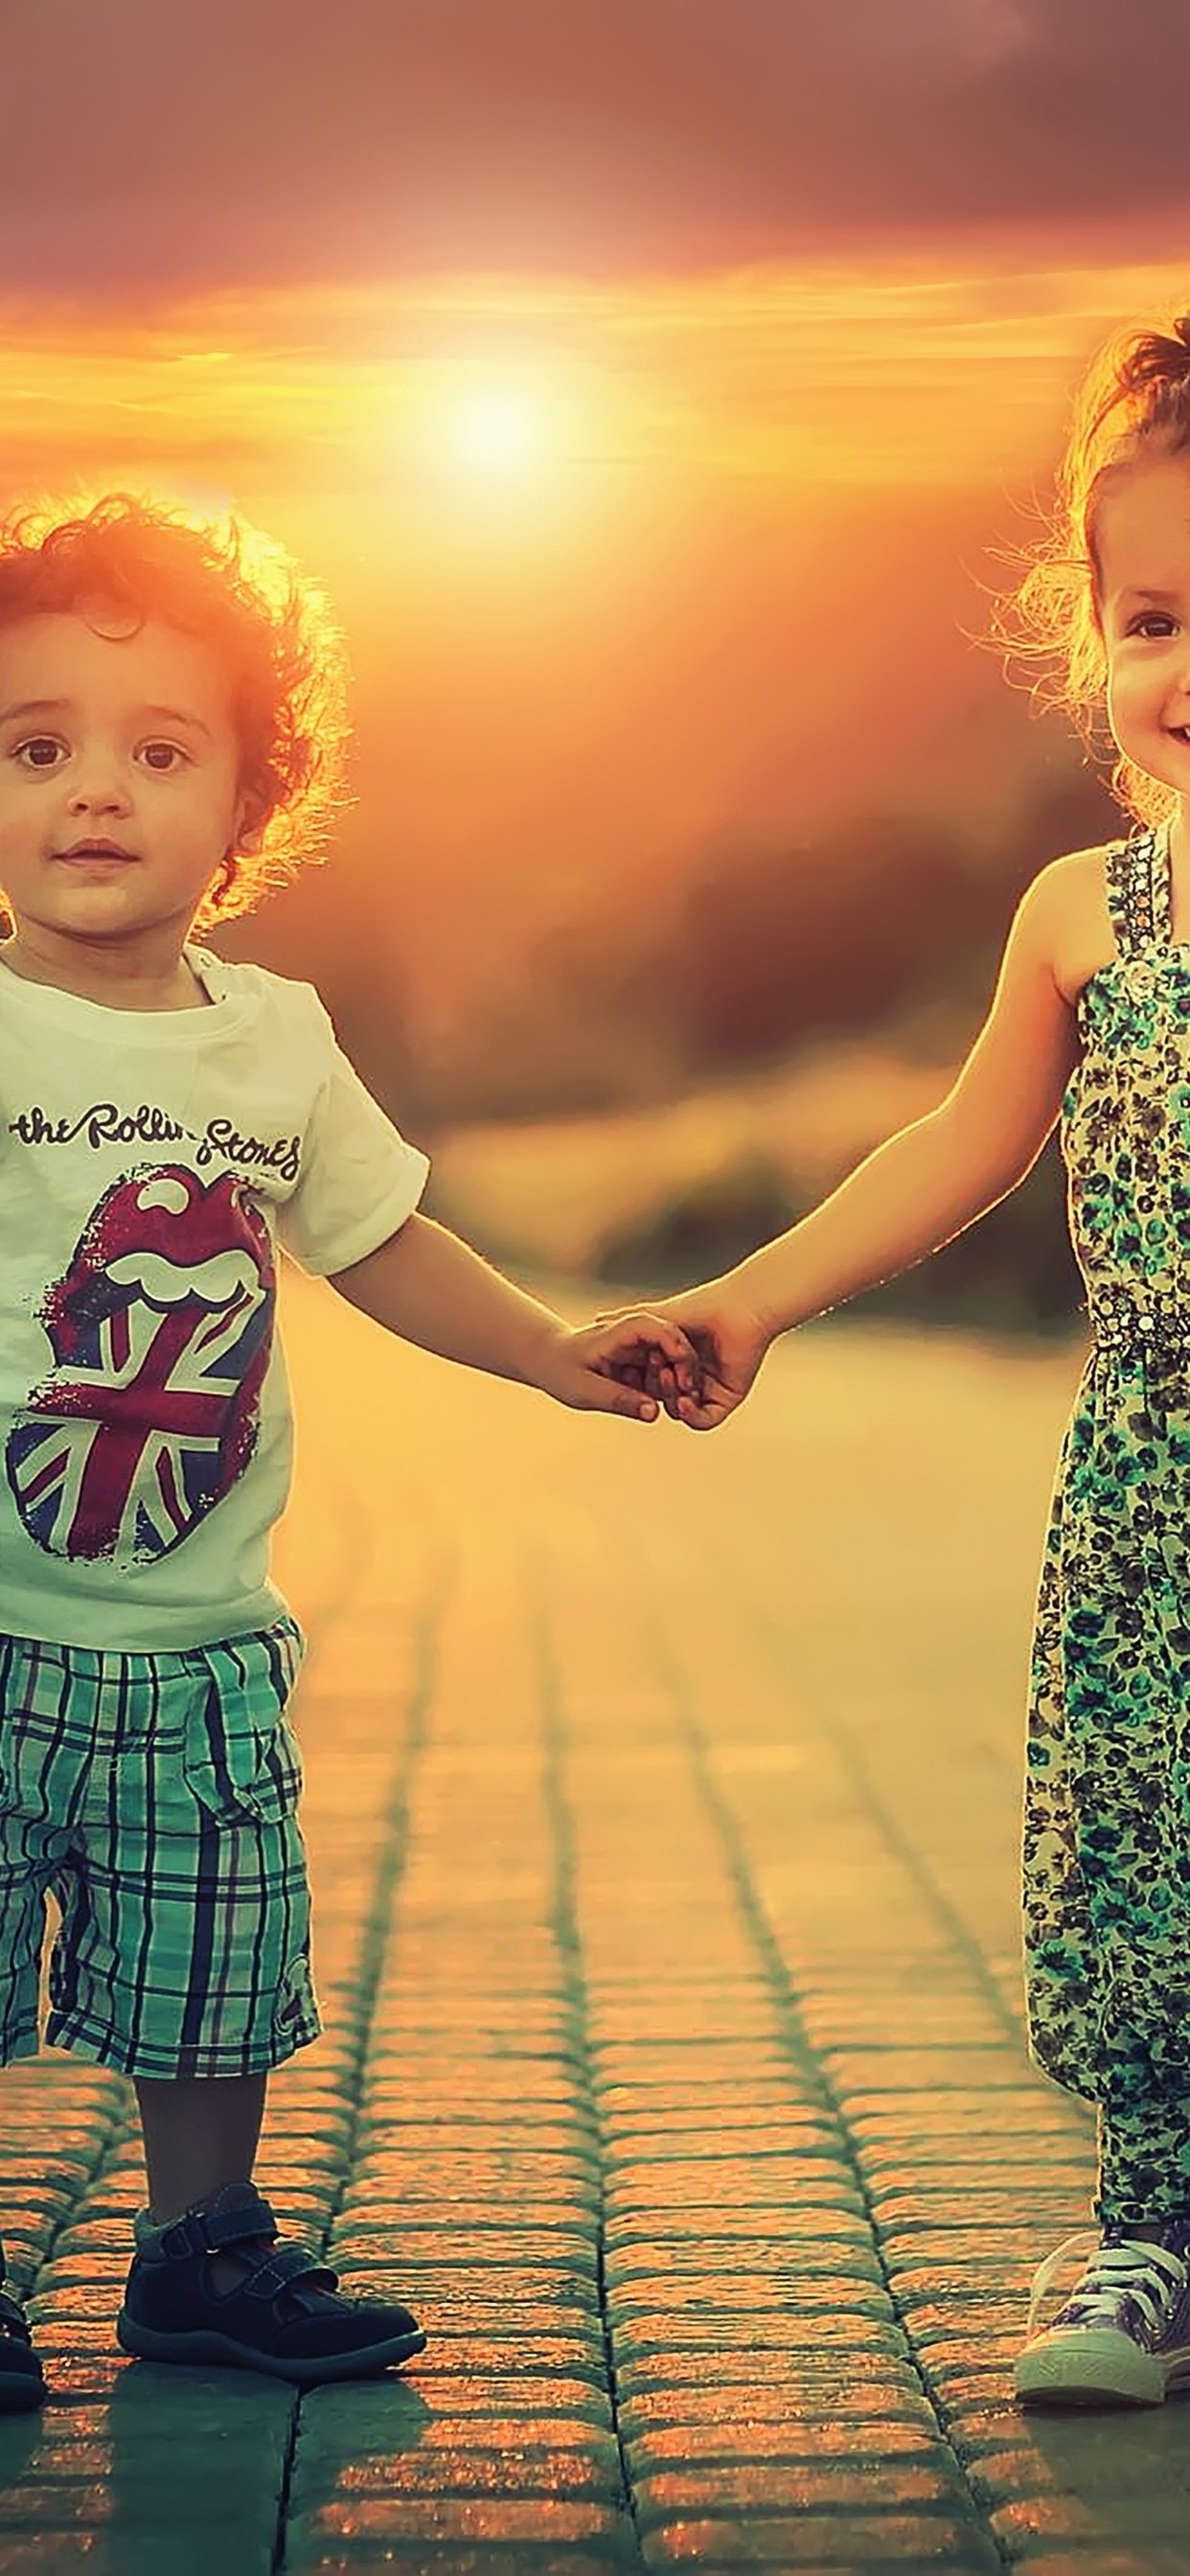 children-happiness-portrait-5k-jz.jpg